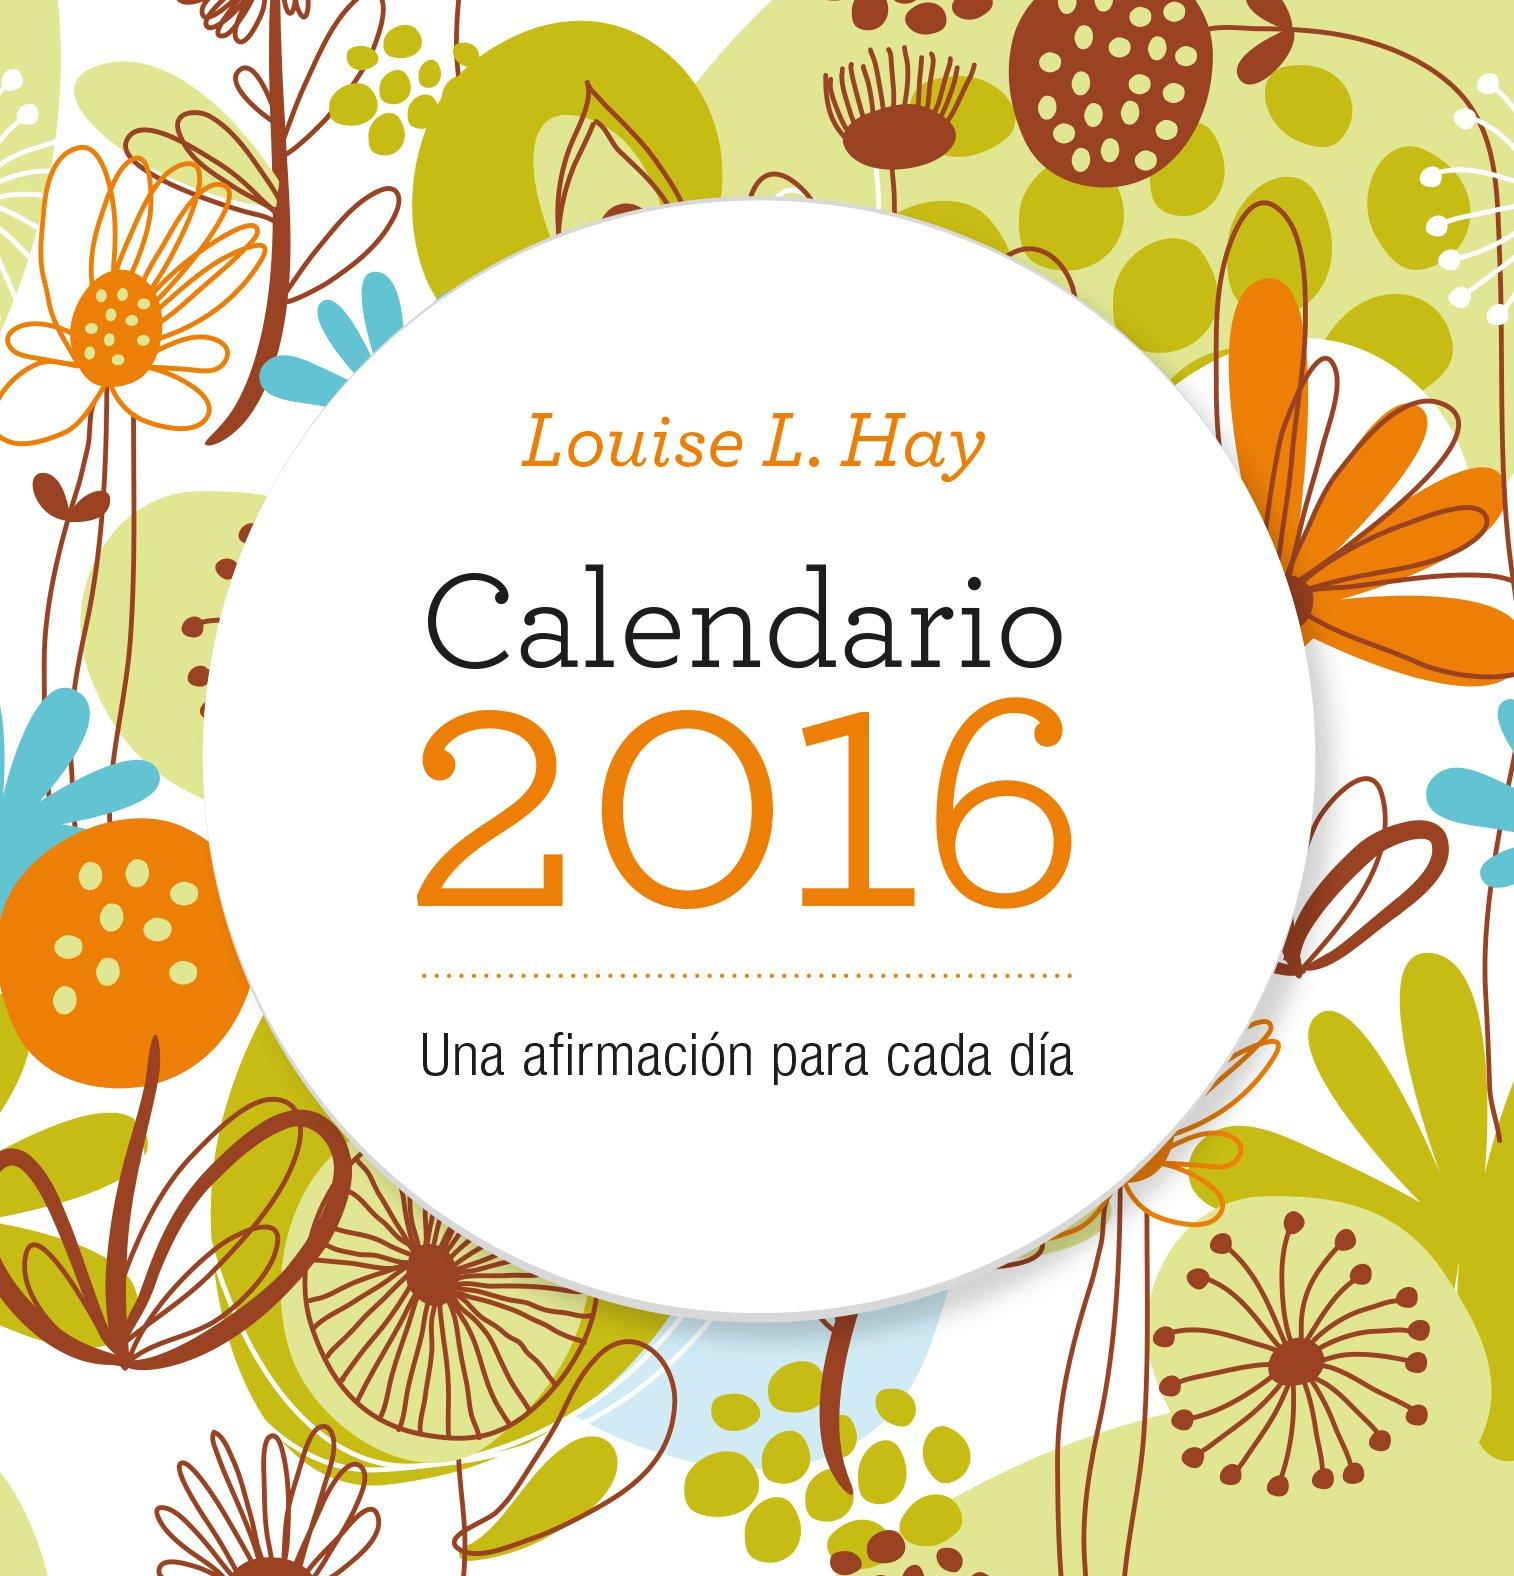 Calendario Louis Hay 2016 Spanish product image